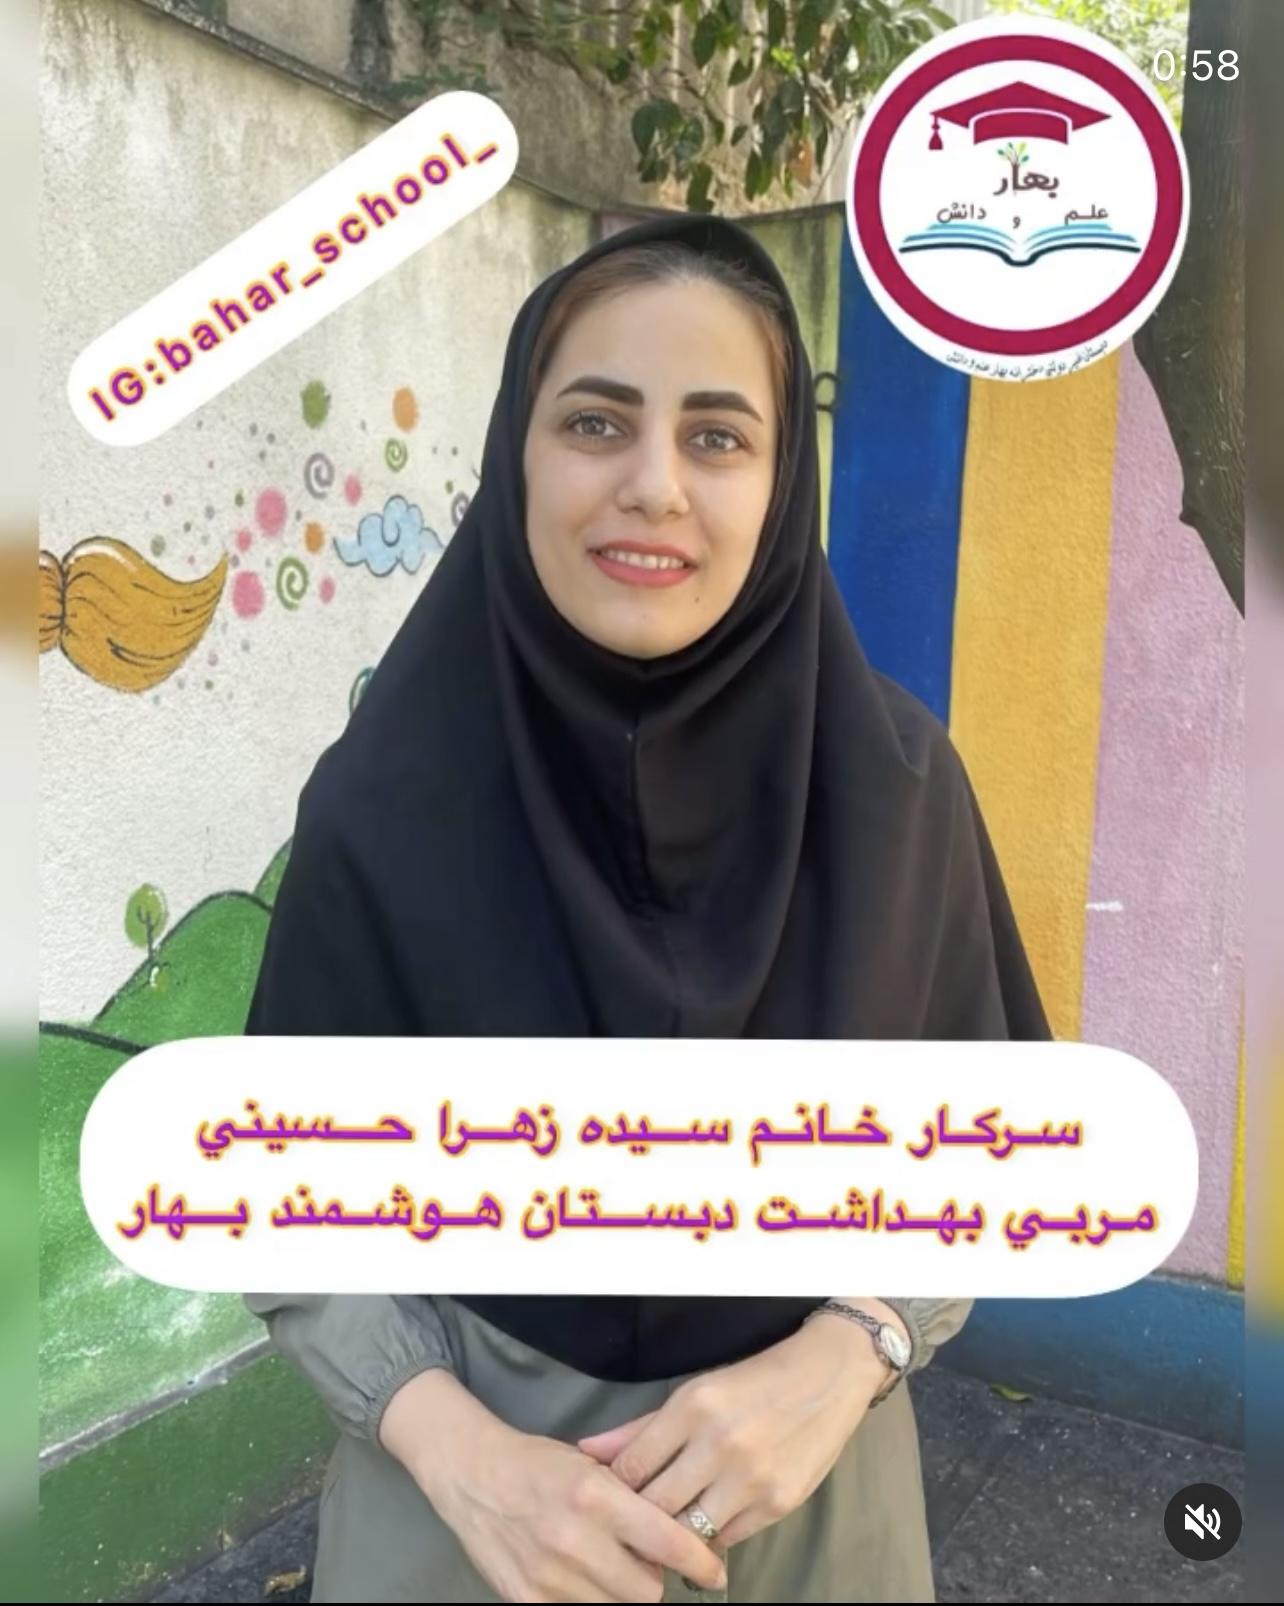 سركار خانم حسيني مربي بهداشت